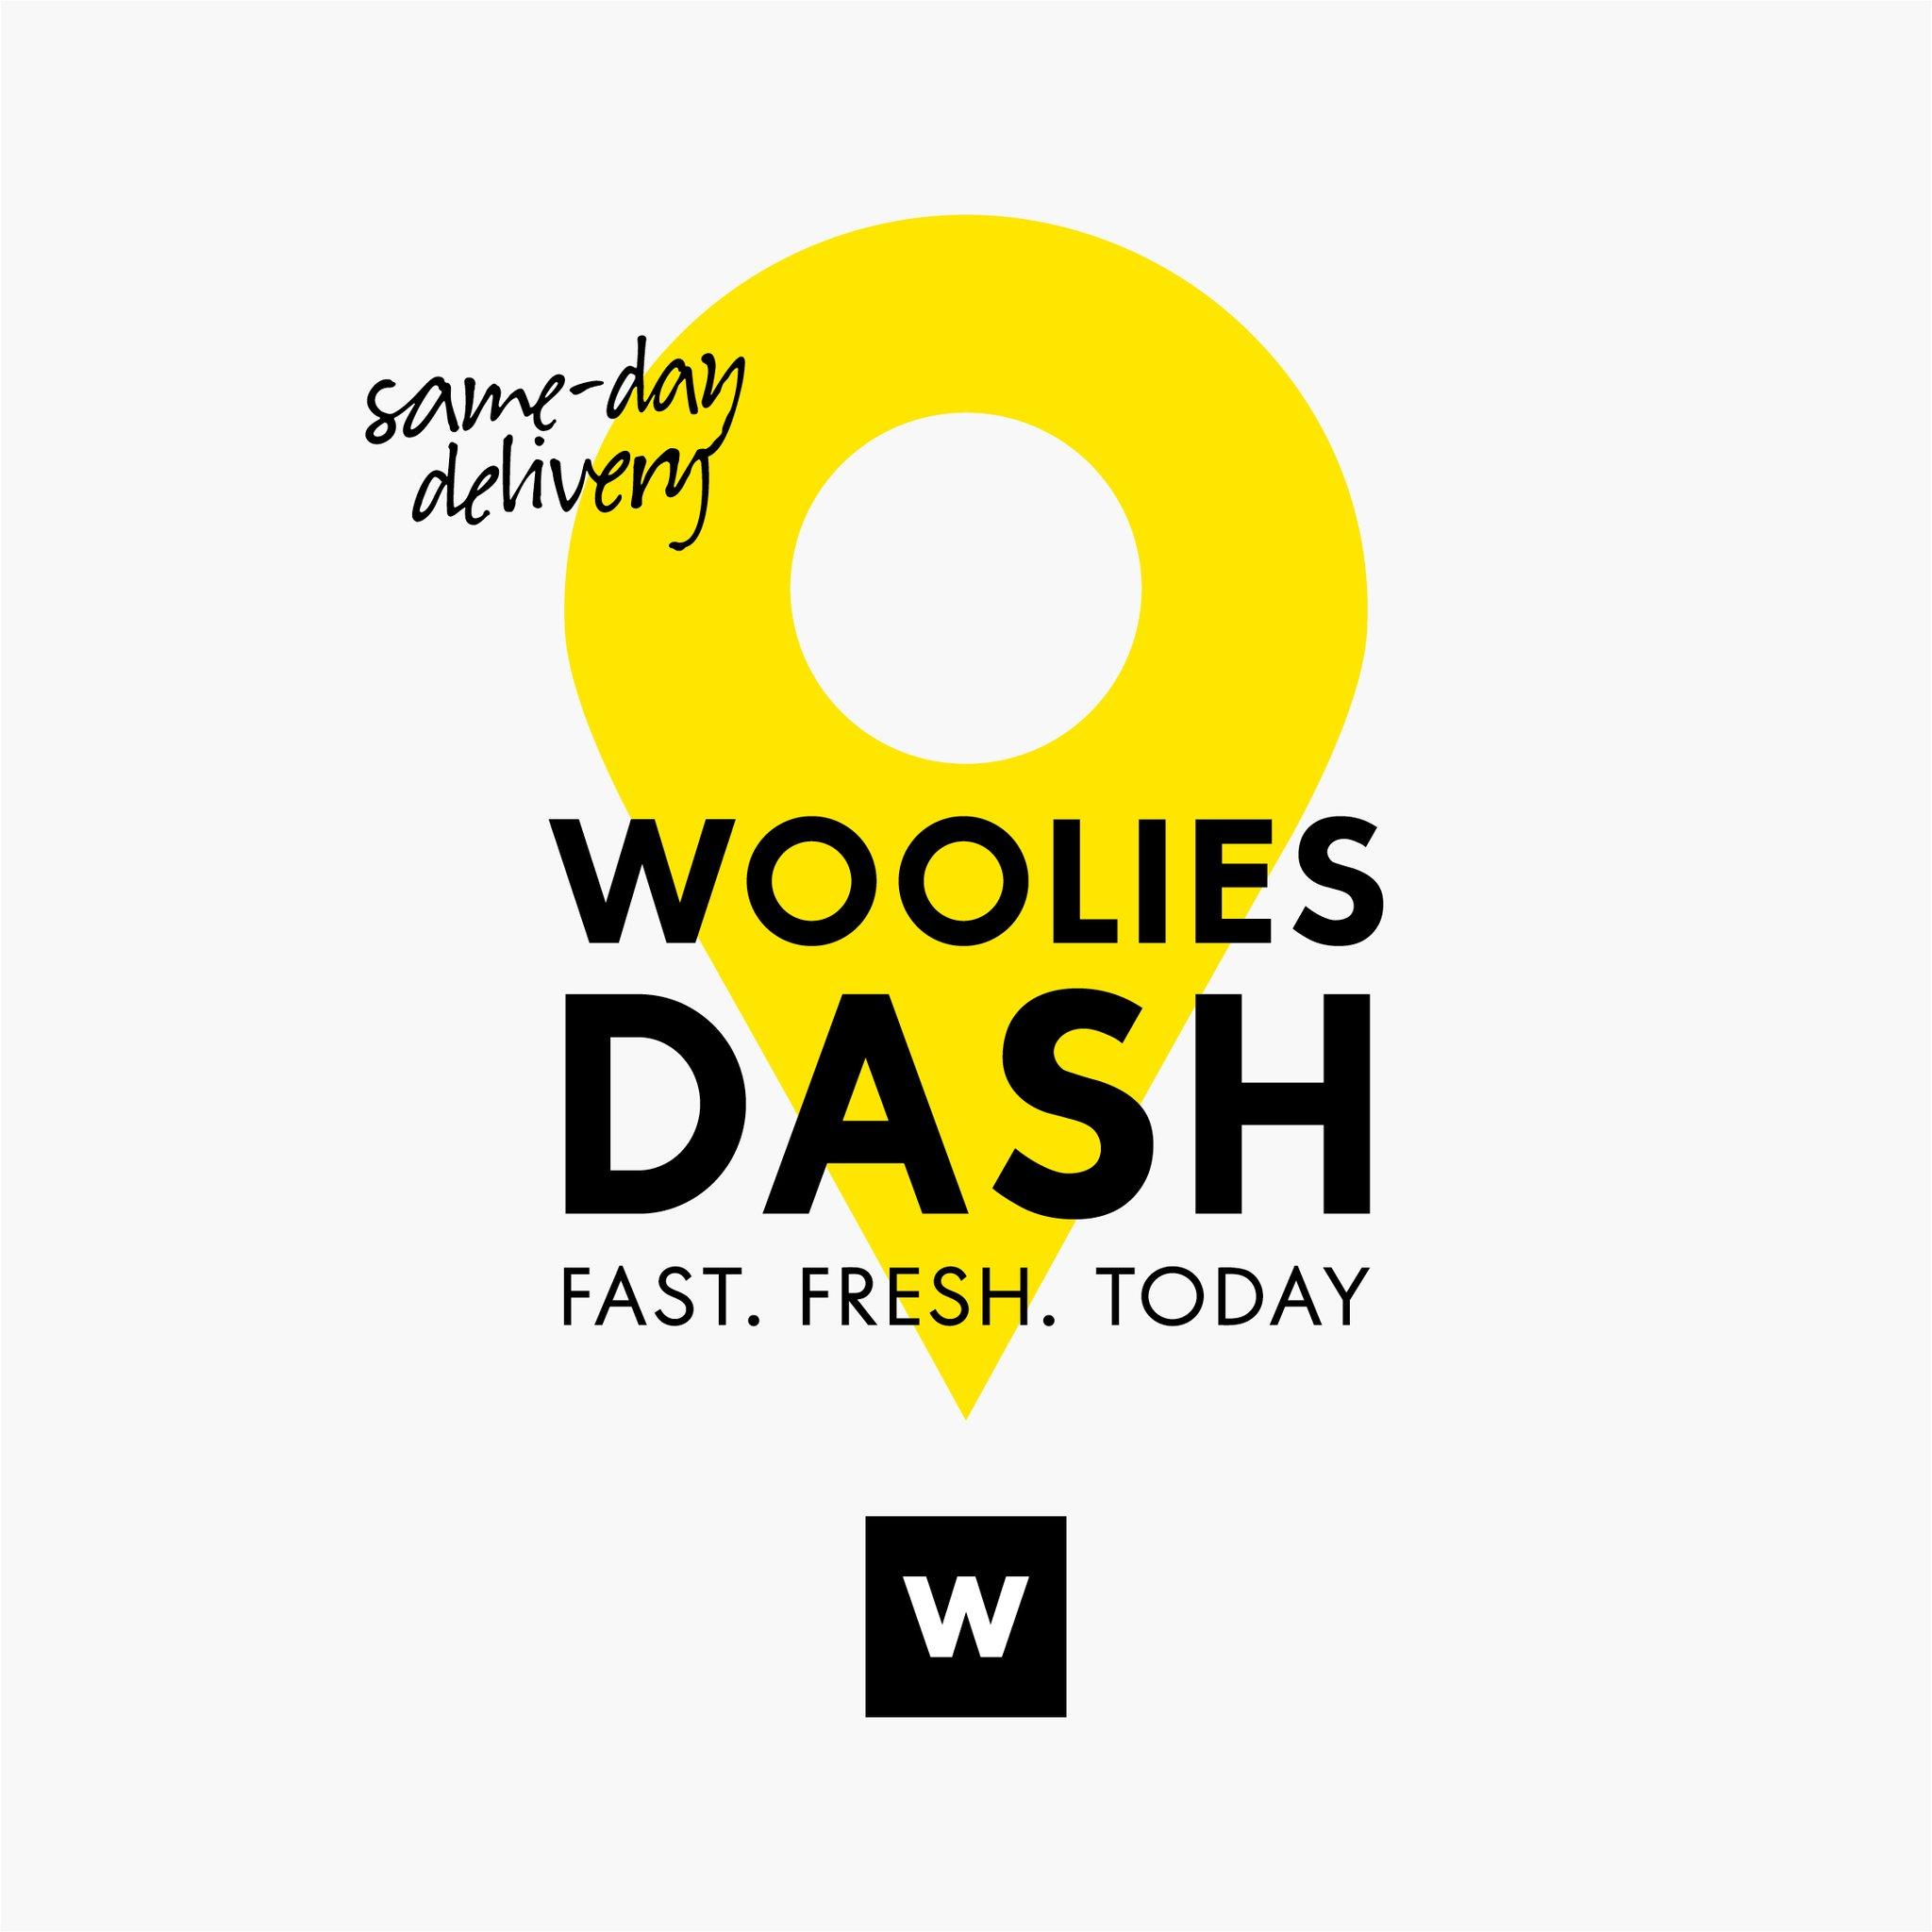 Woolies Photo,Woolies Twitter Trend : Most Popular Tweets